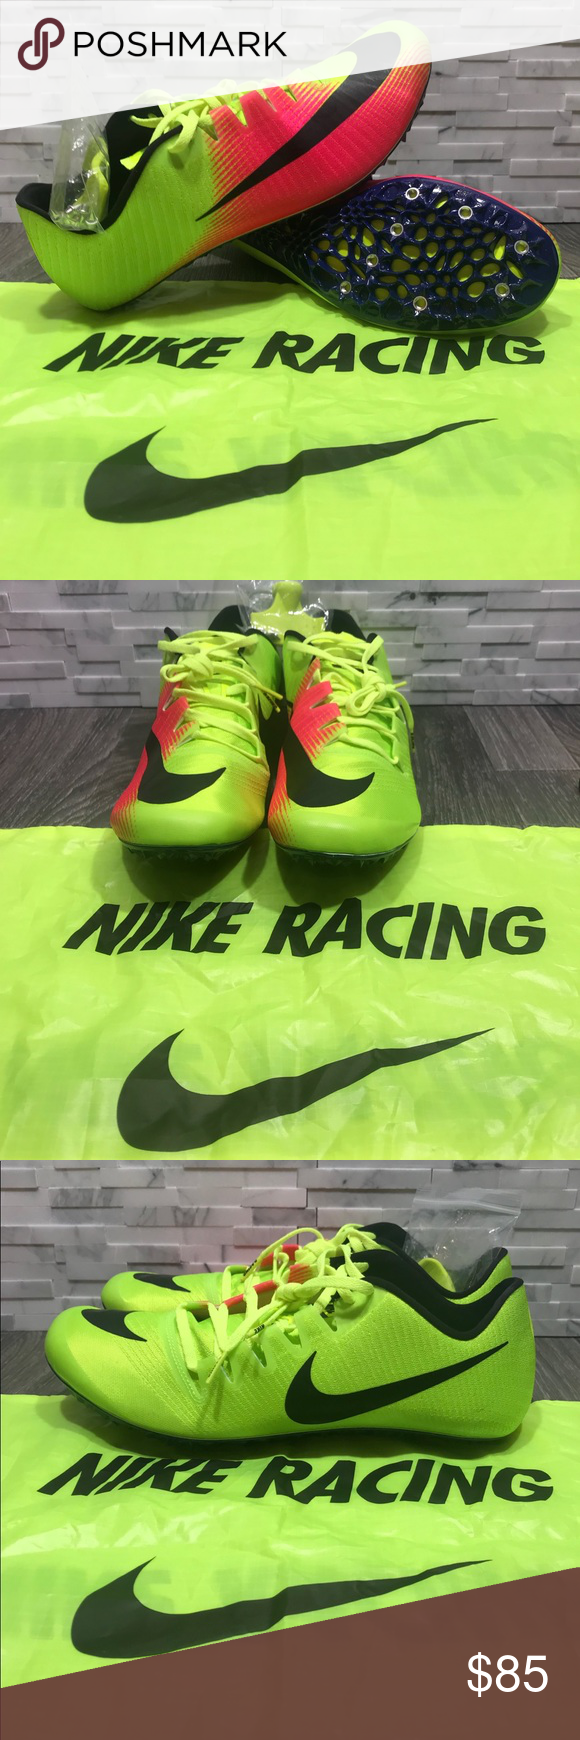 2beccfb8710ac NWOT Nike Zoom Forever XC 5 Track Spike Sz 12.5 Men s Nike Zoom Forever XC 5